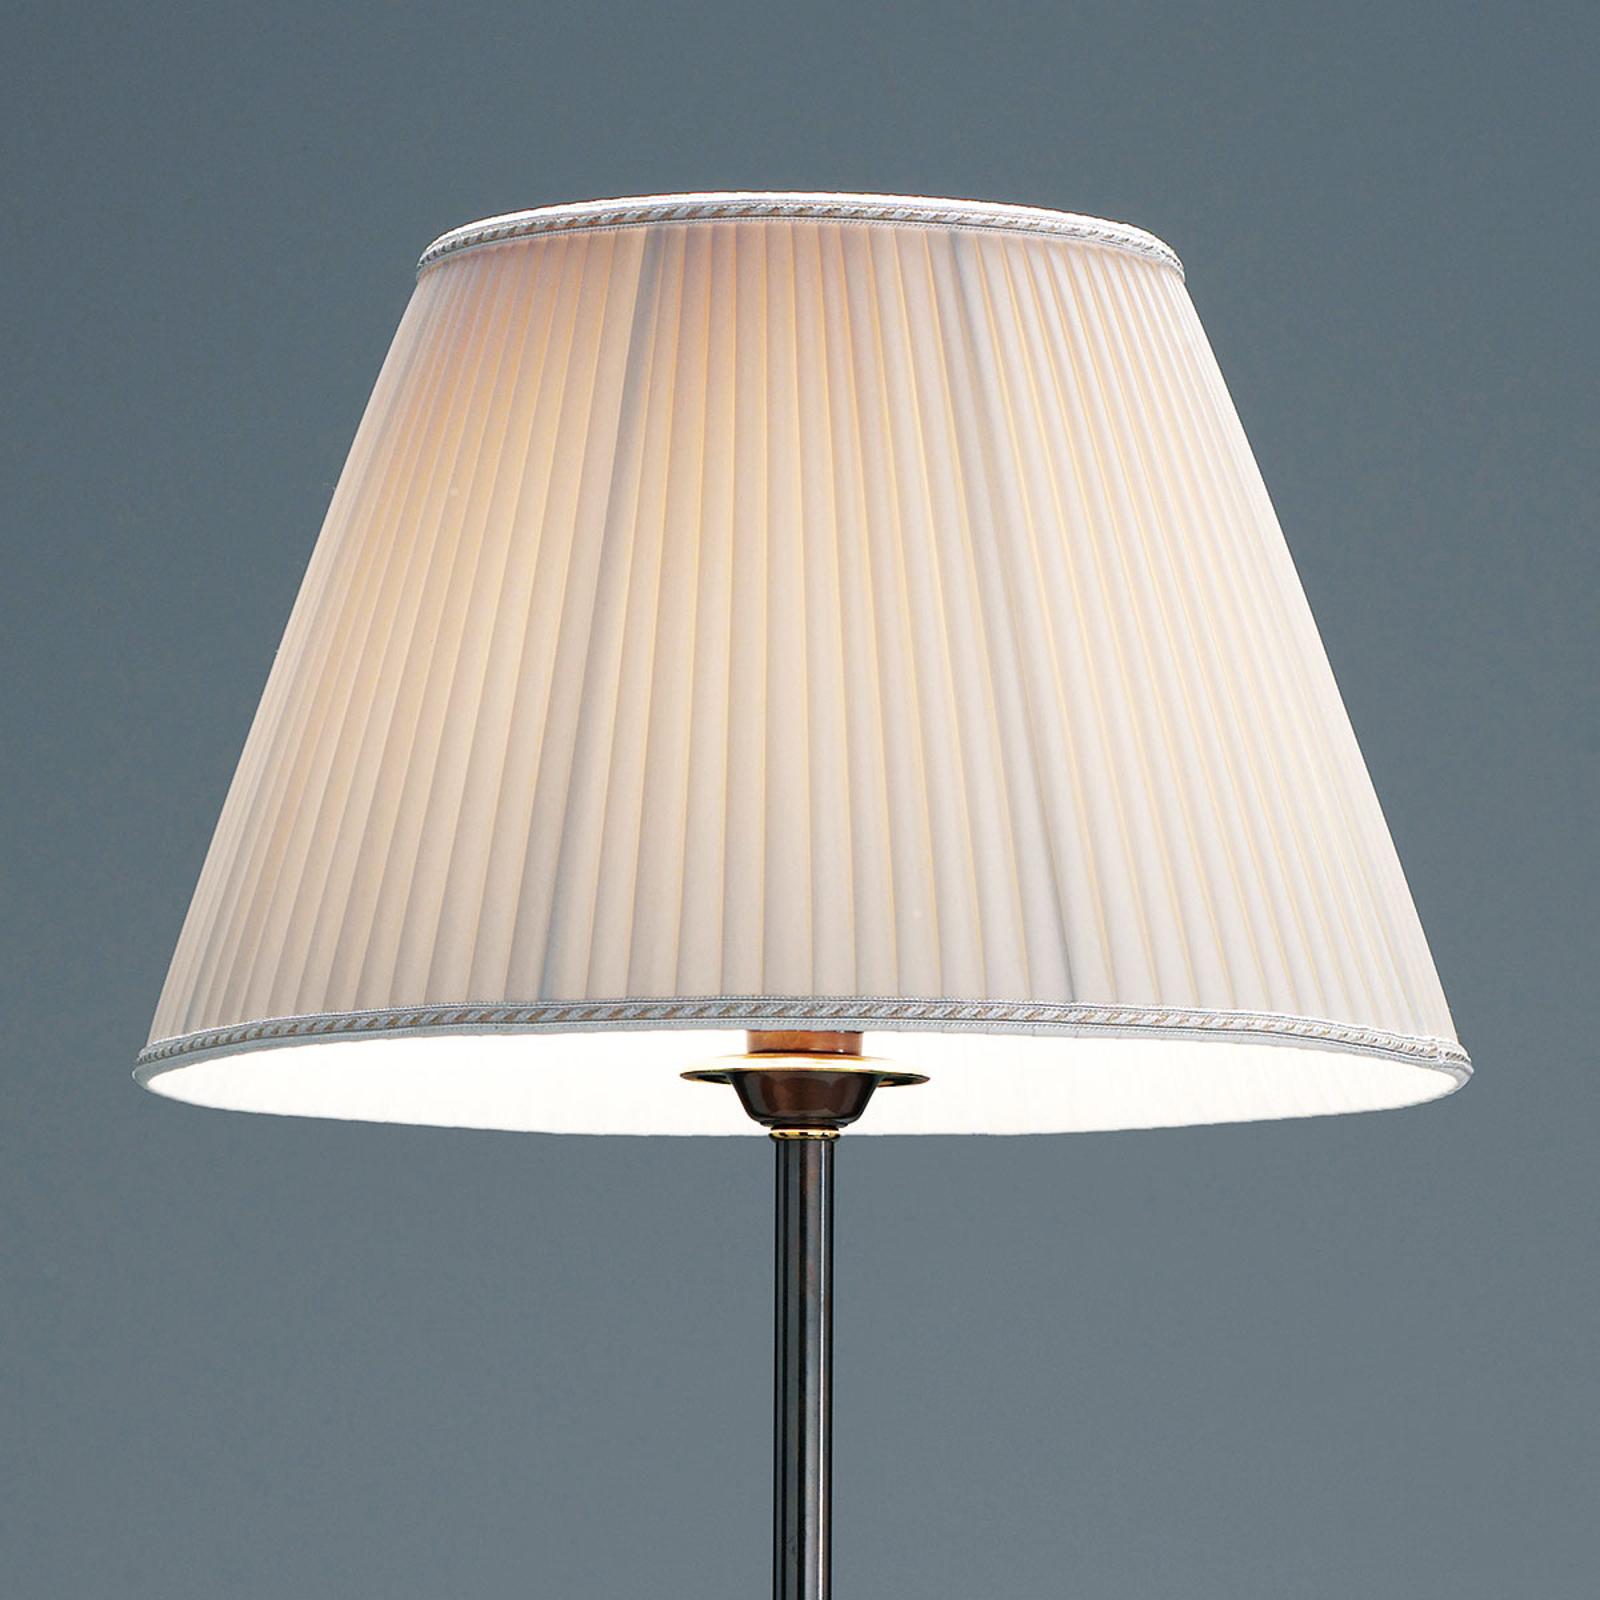 Tijdloze vloerlamp Classic